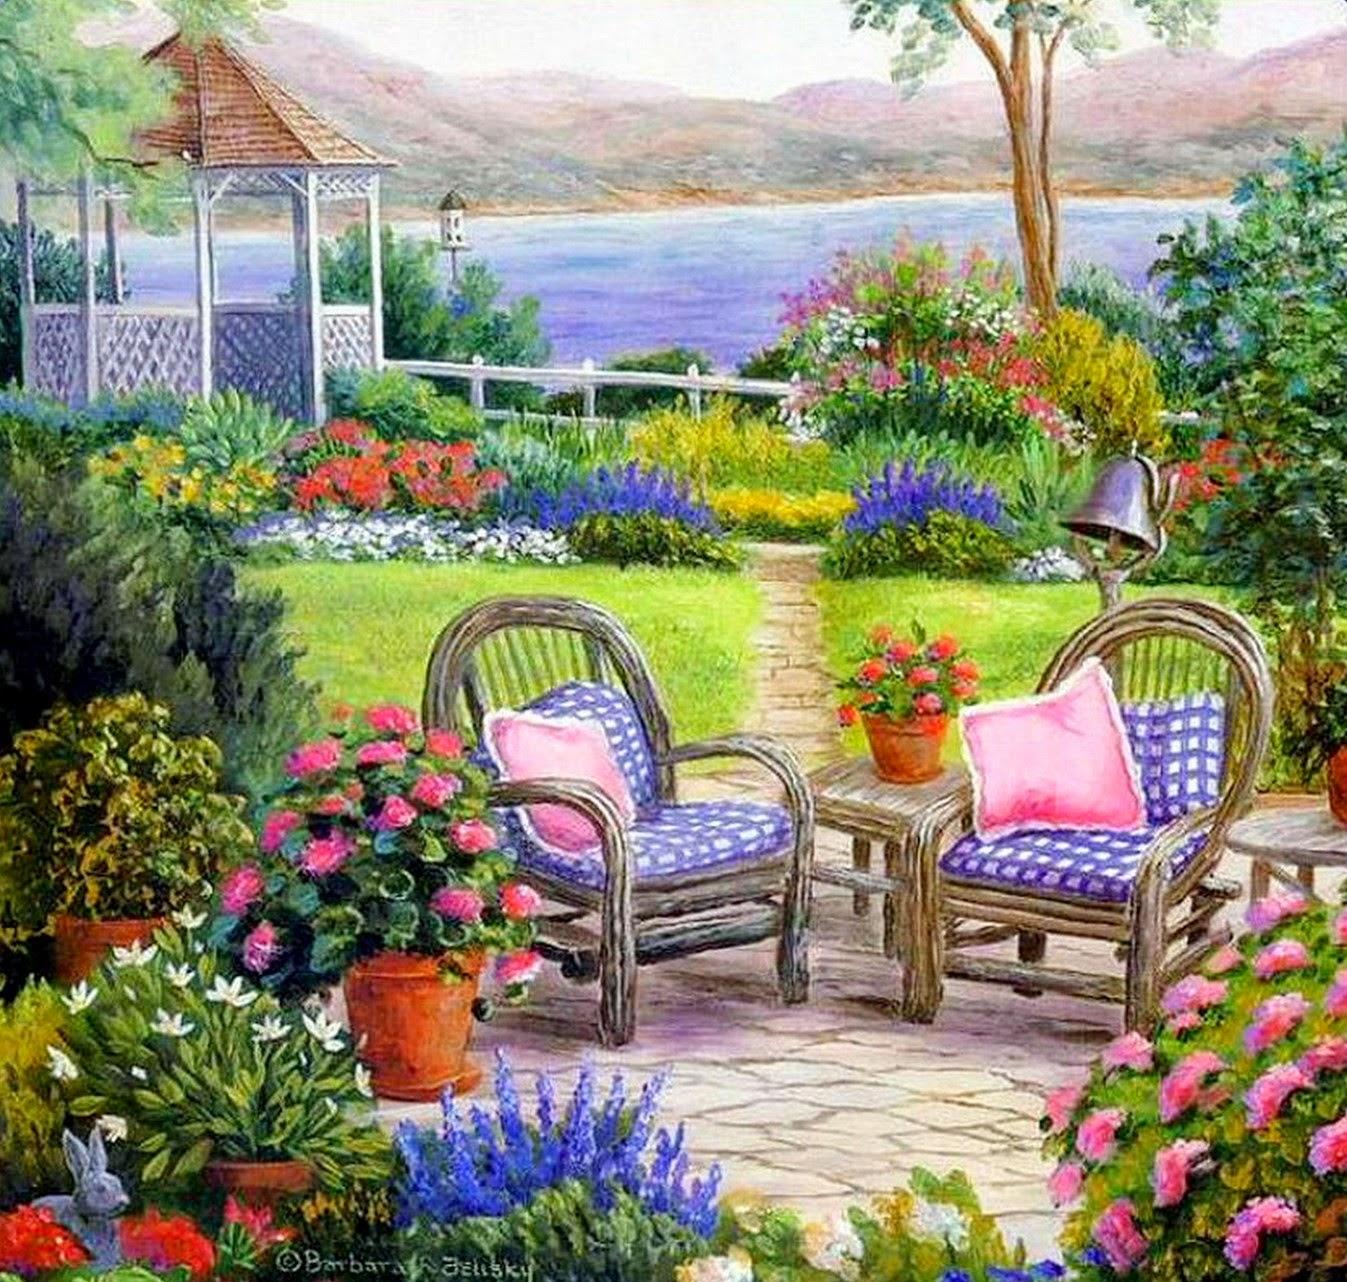 pinturas-impresionistas-al-oleo-de-paisajes